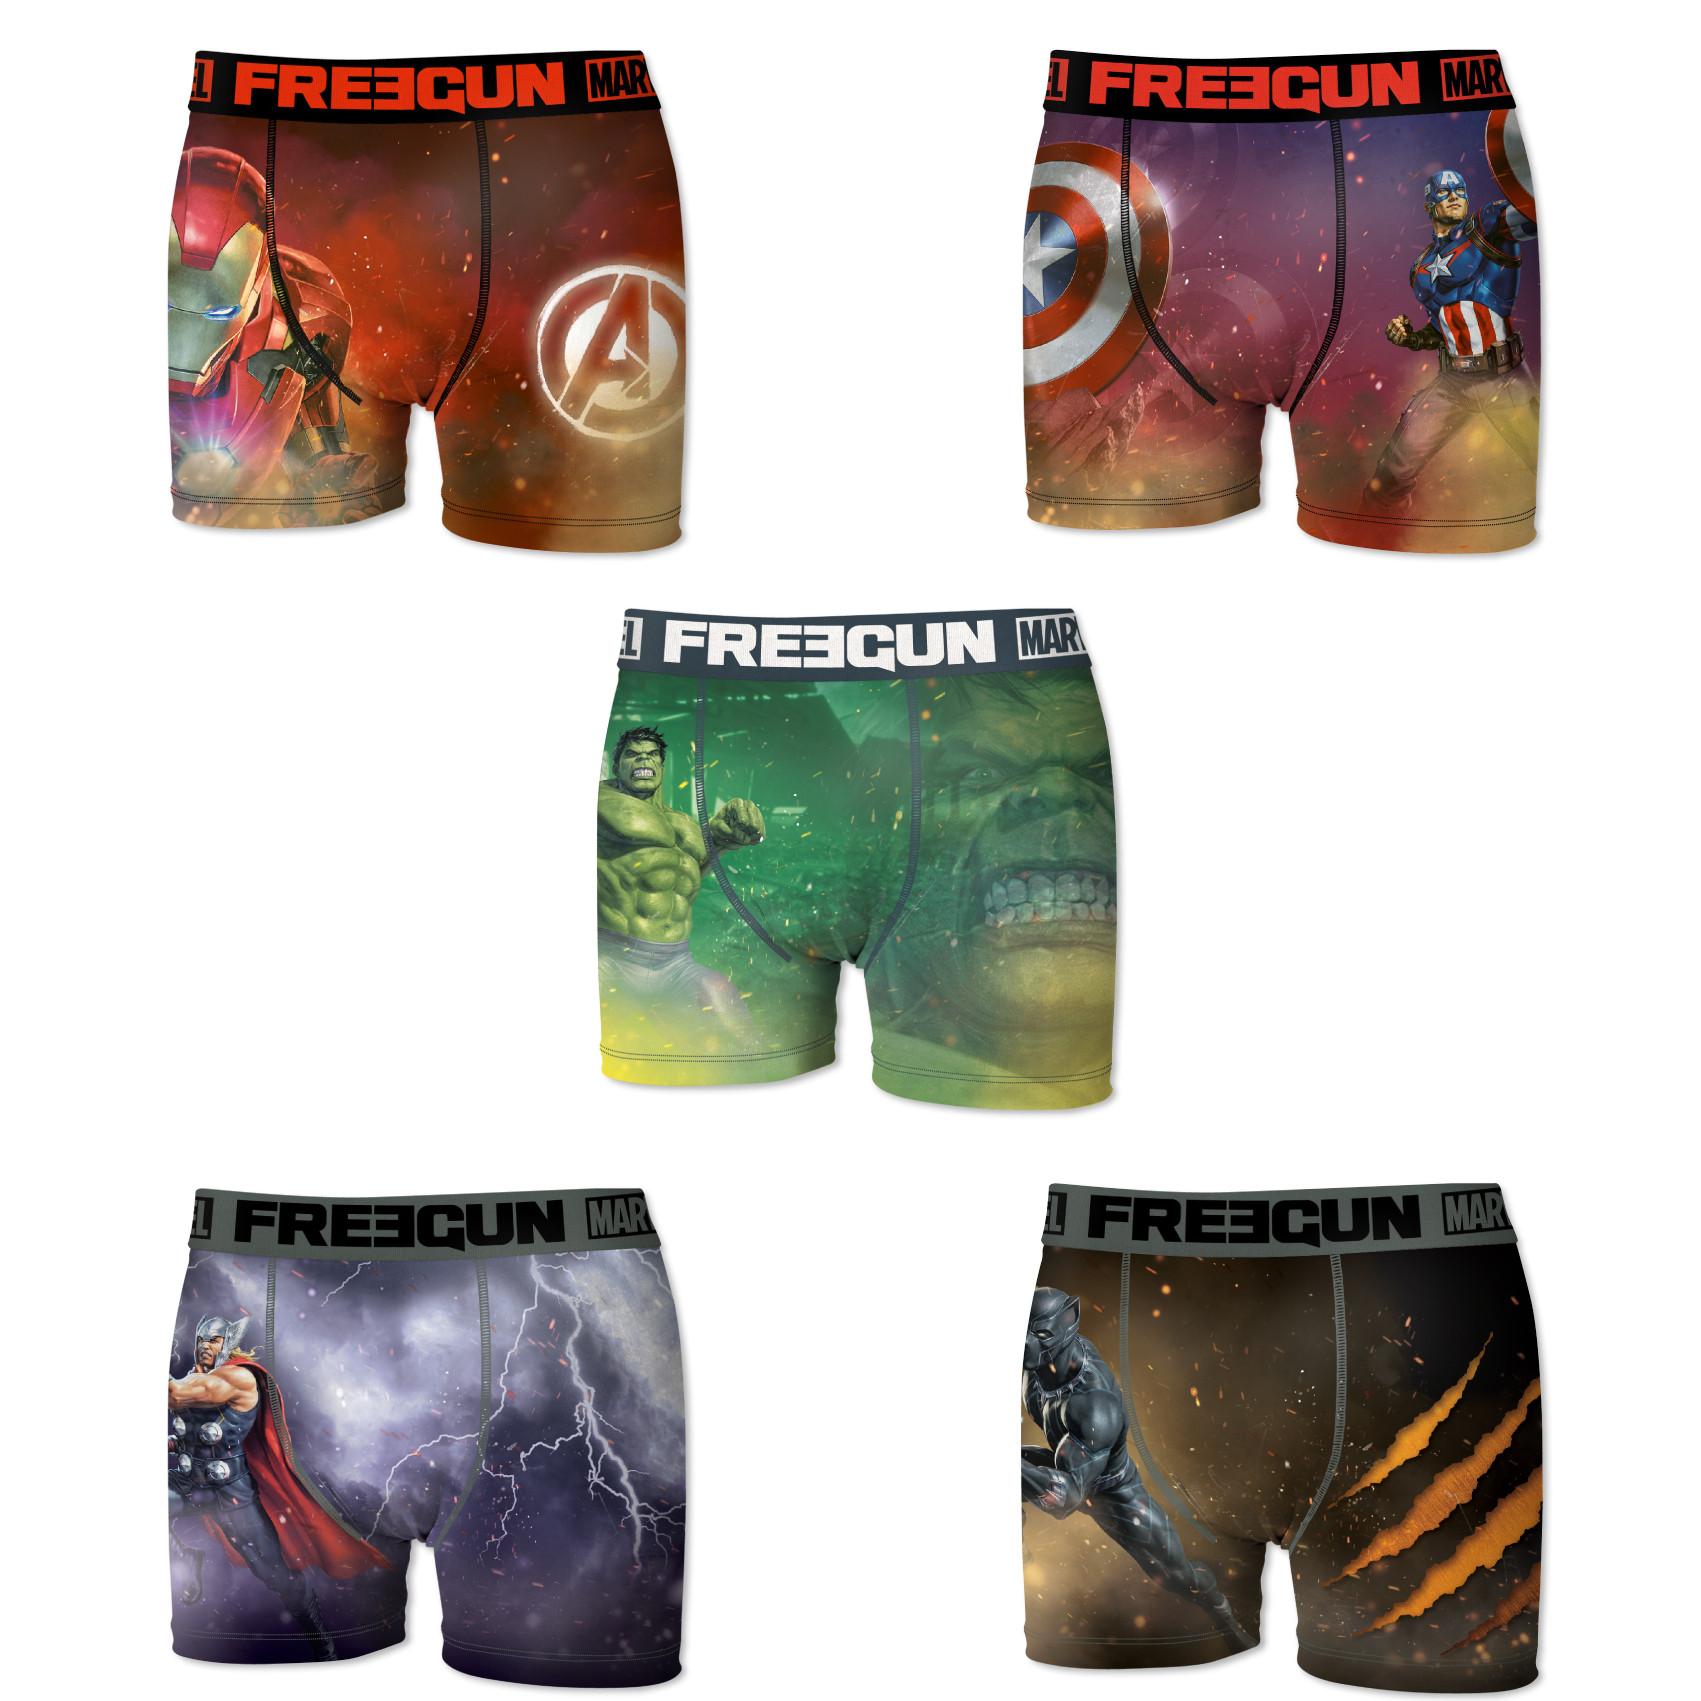 Boxers hommme microfibre packx5 freegun marvel e1 (photo)